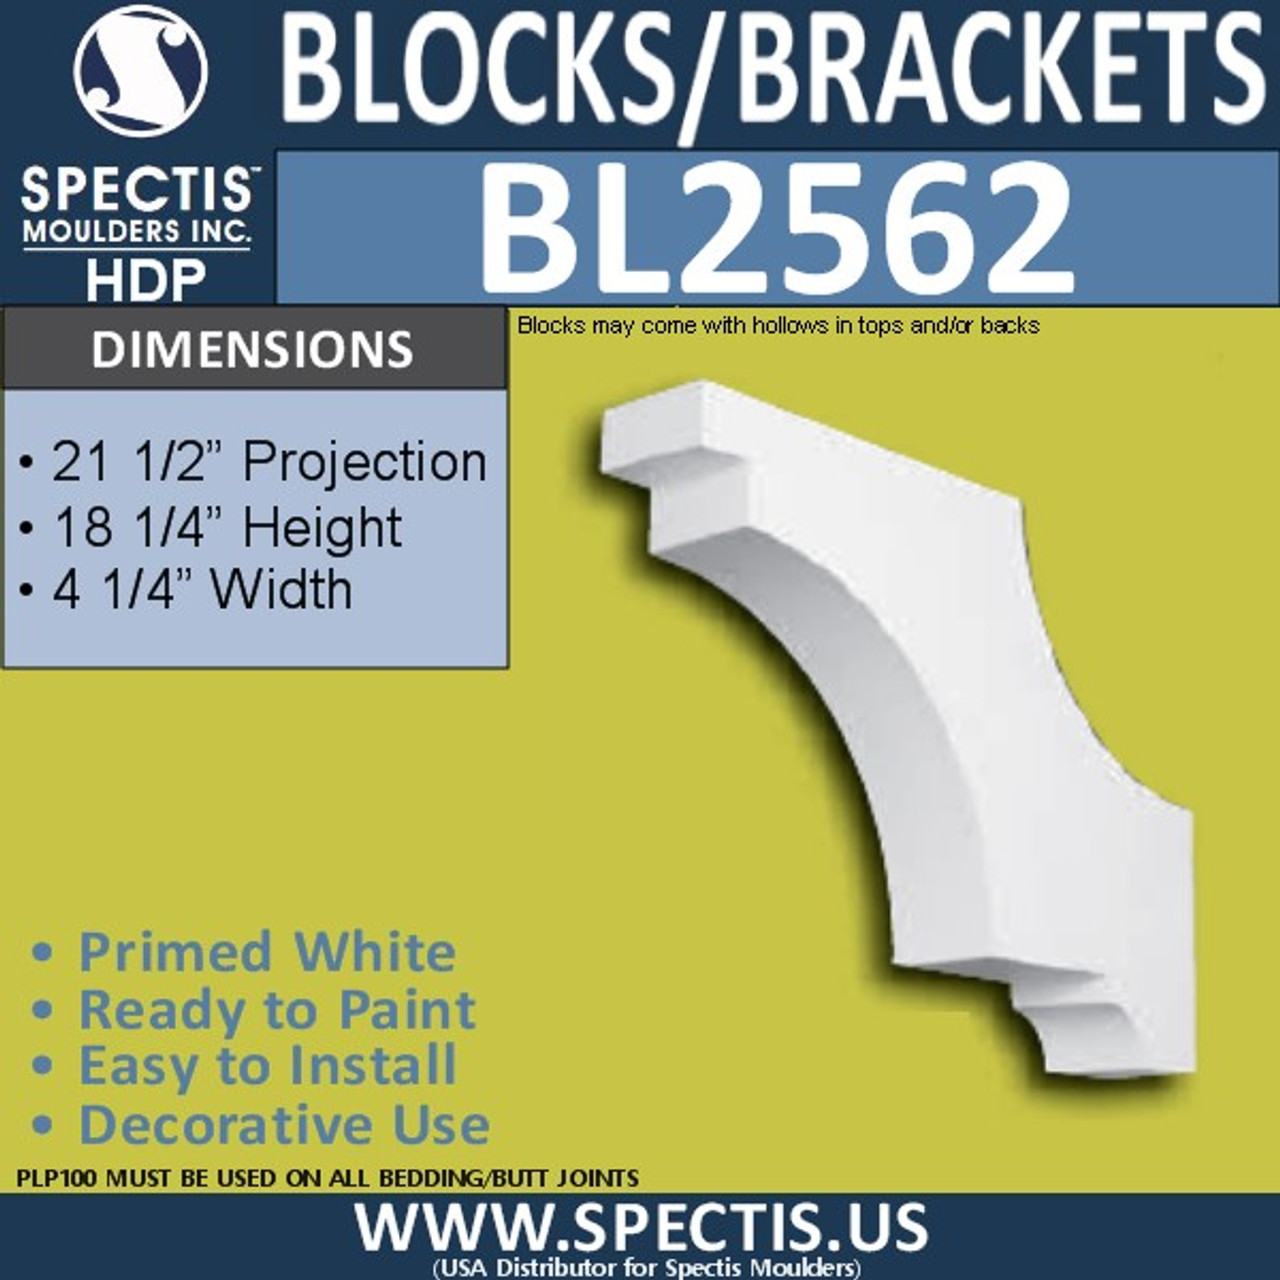 "BL2562 Eave Block or Bracket 4.25""W x 24.5""H x 18.25"" P"